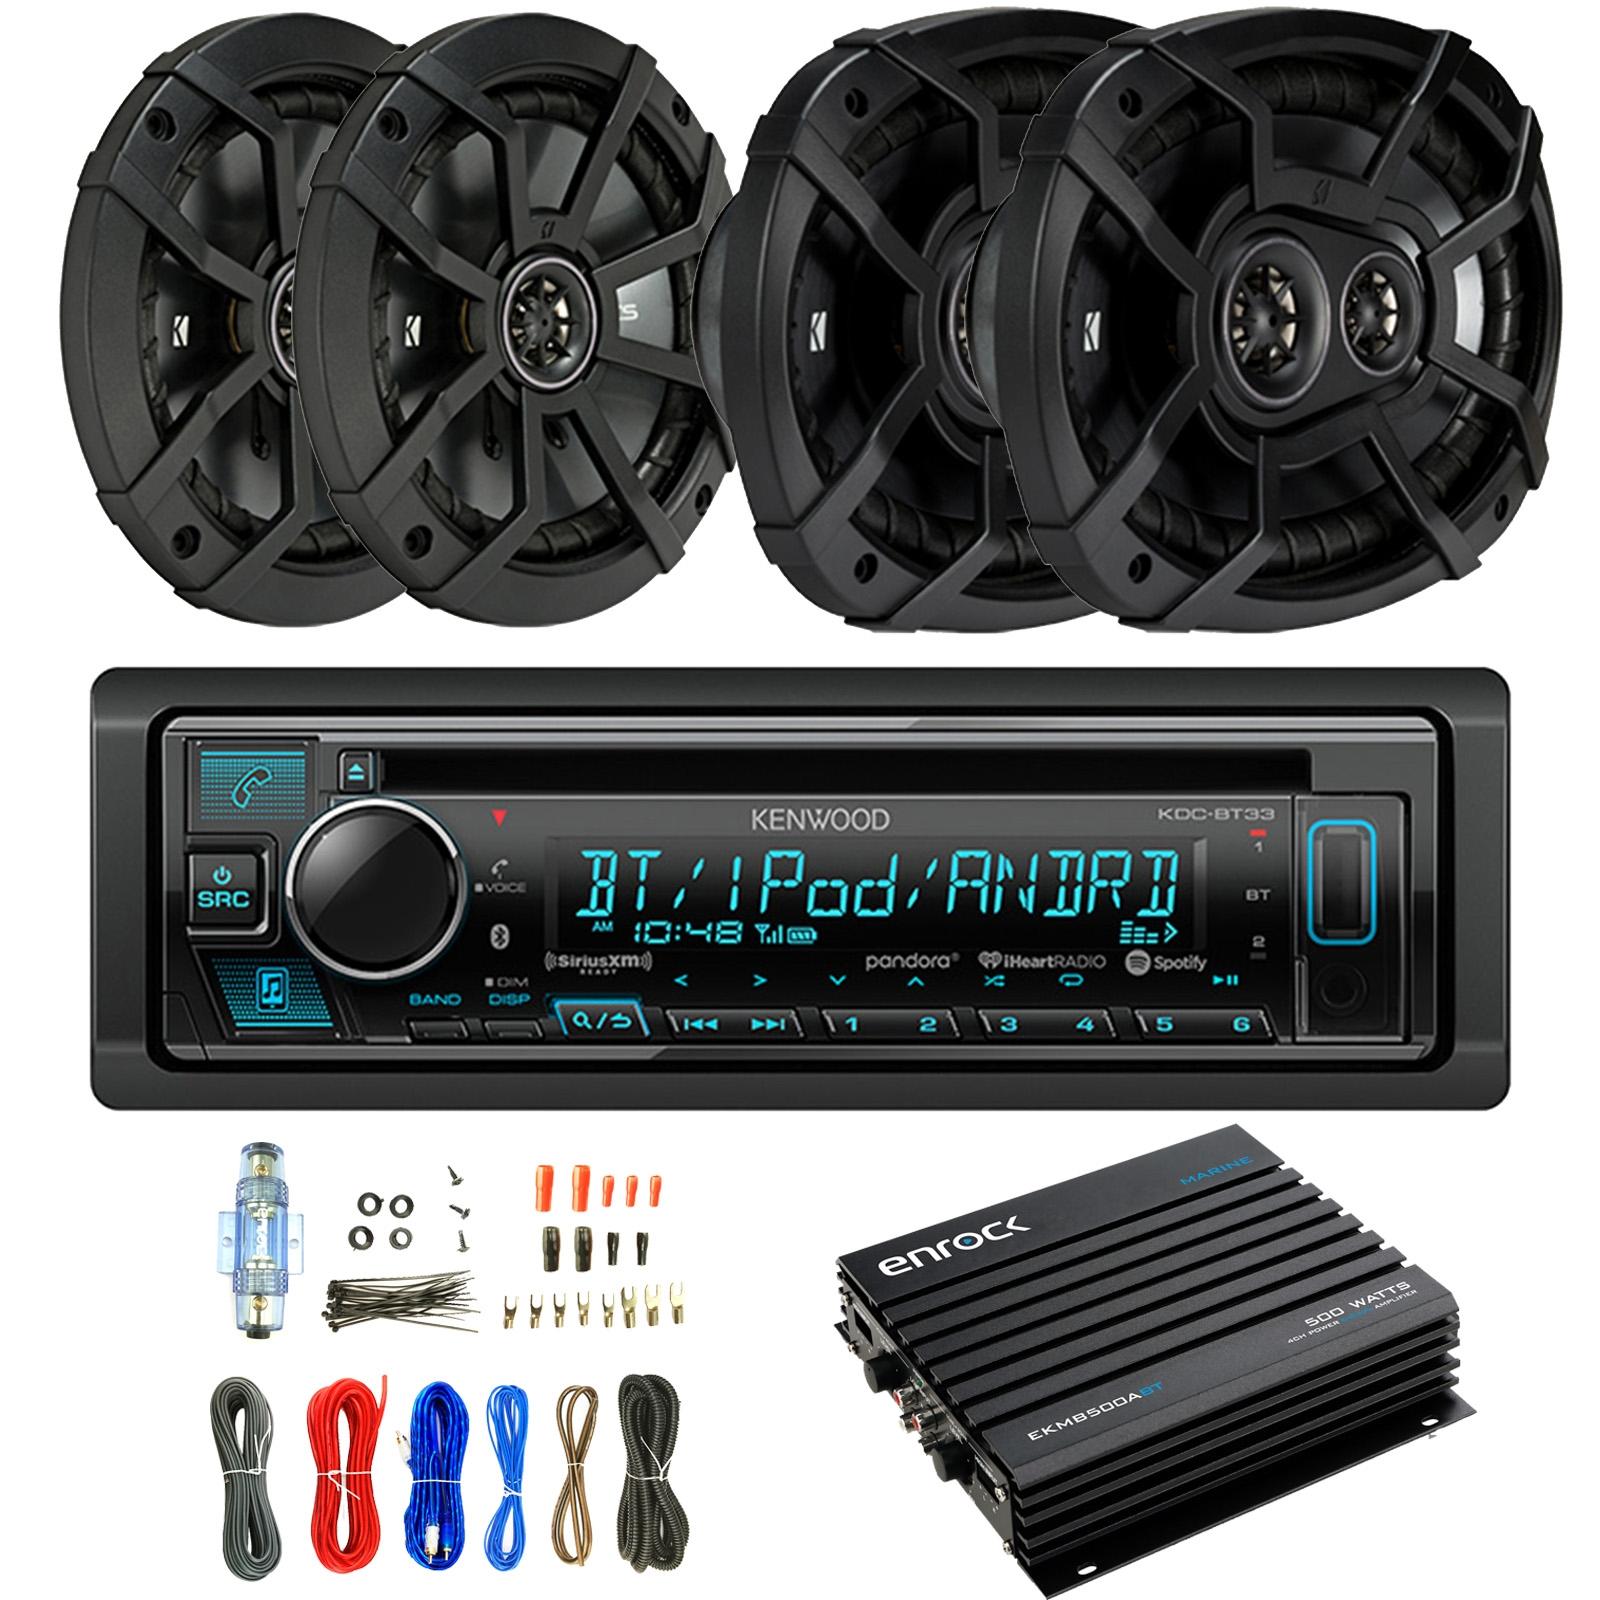 "Kenwood KDC-BT33 Single-DIN In-Dash CD/Bluetooth Receiver, 2 x Kicker 43CSC654 6.5"" 2-Way Car Speakers, 2 x Kicker 6x9"" 3-Way Audio Speakers, 4-Channel Amplifier, Amp Installation Kit"